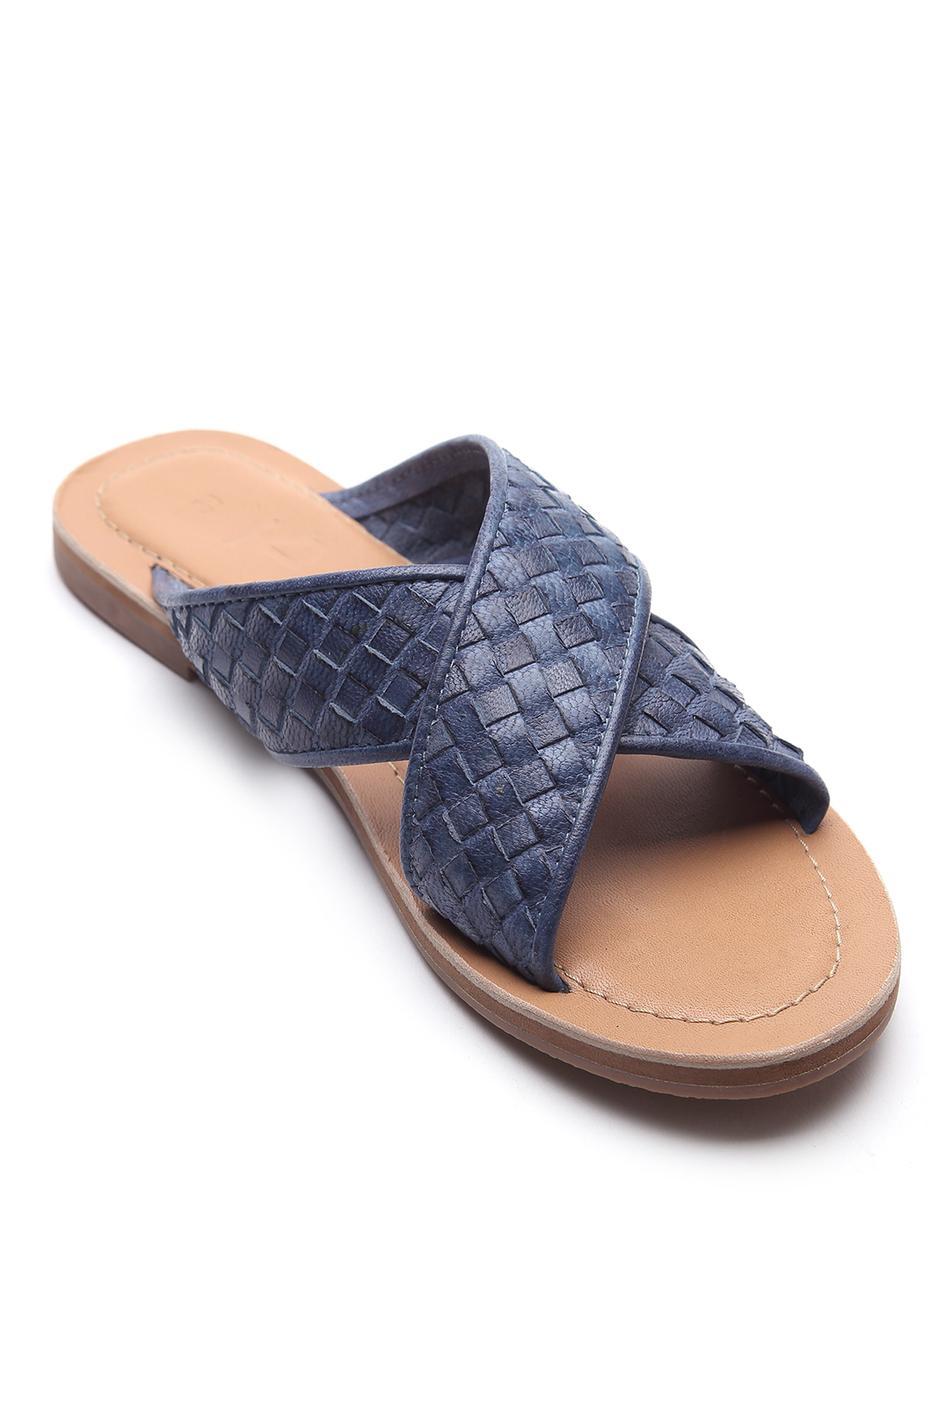 Cross Strap Textured Sandals